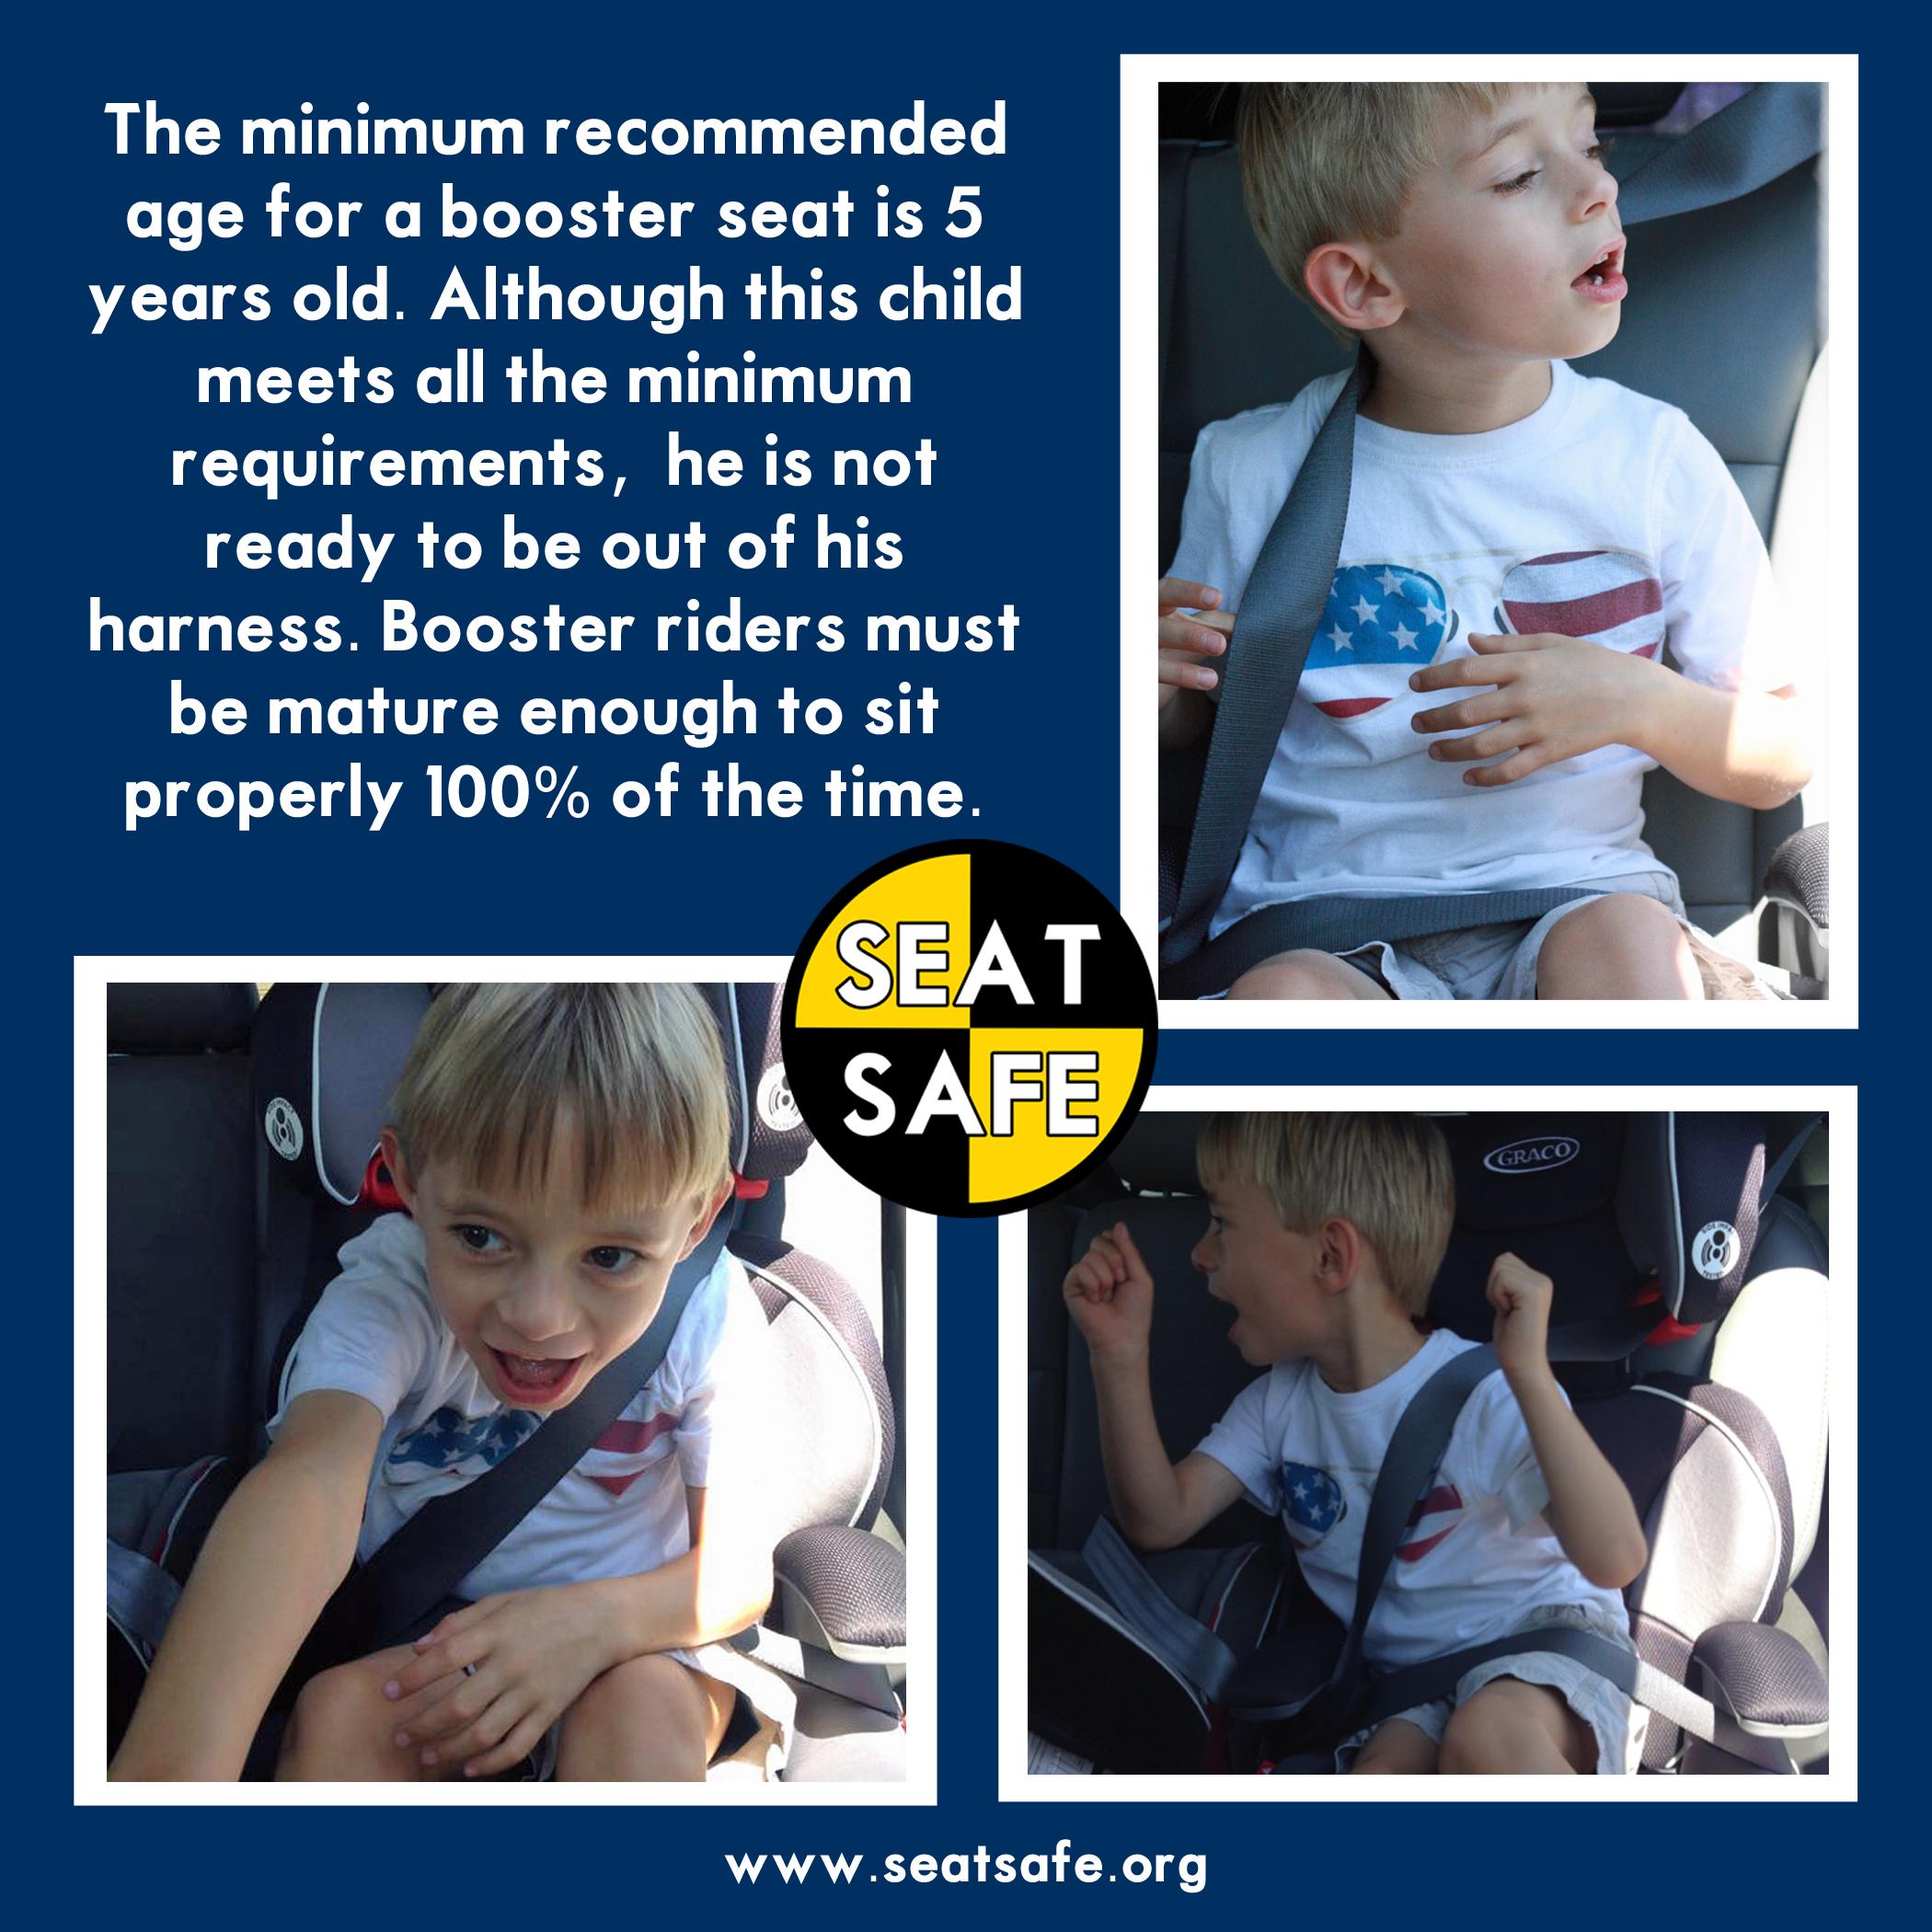 Car Seat Safety Booster Maturity Carseat Safety Safe Car Seats Car Seats